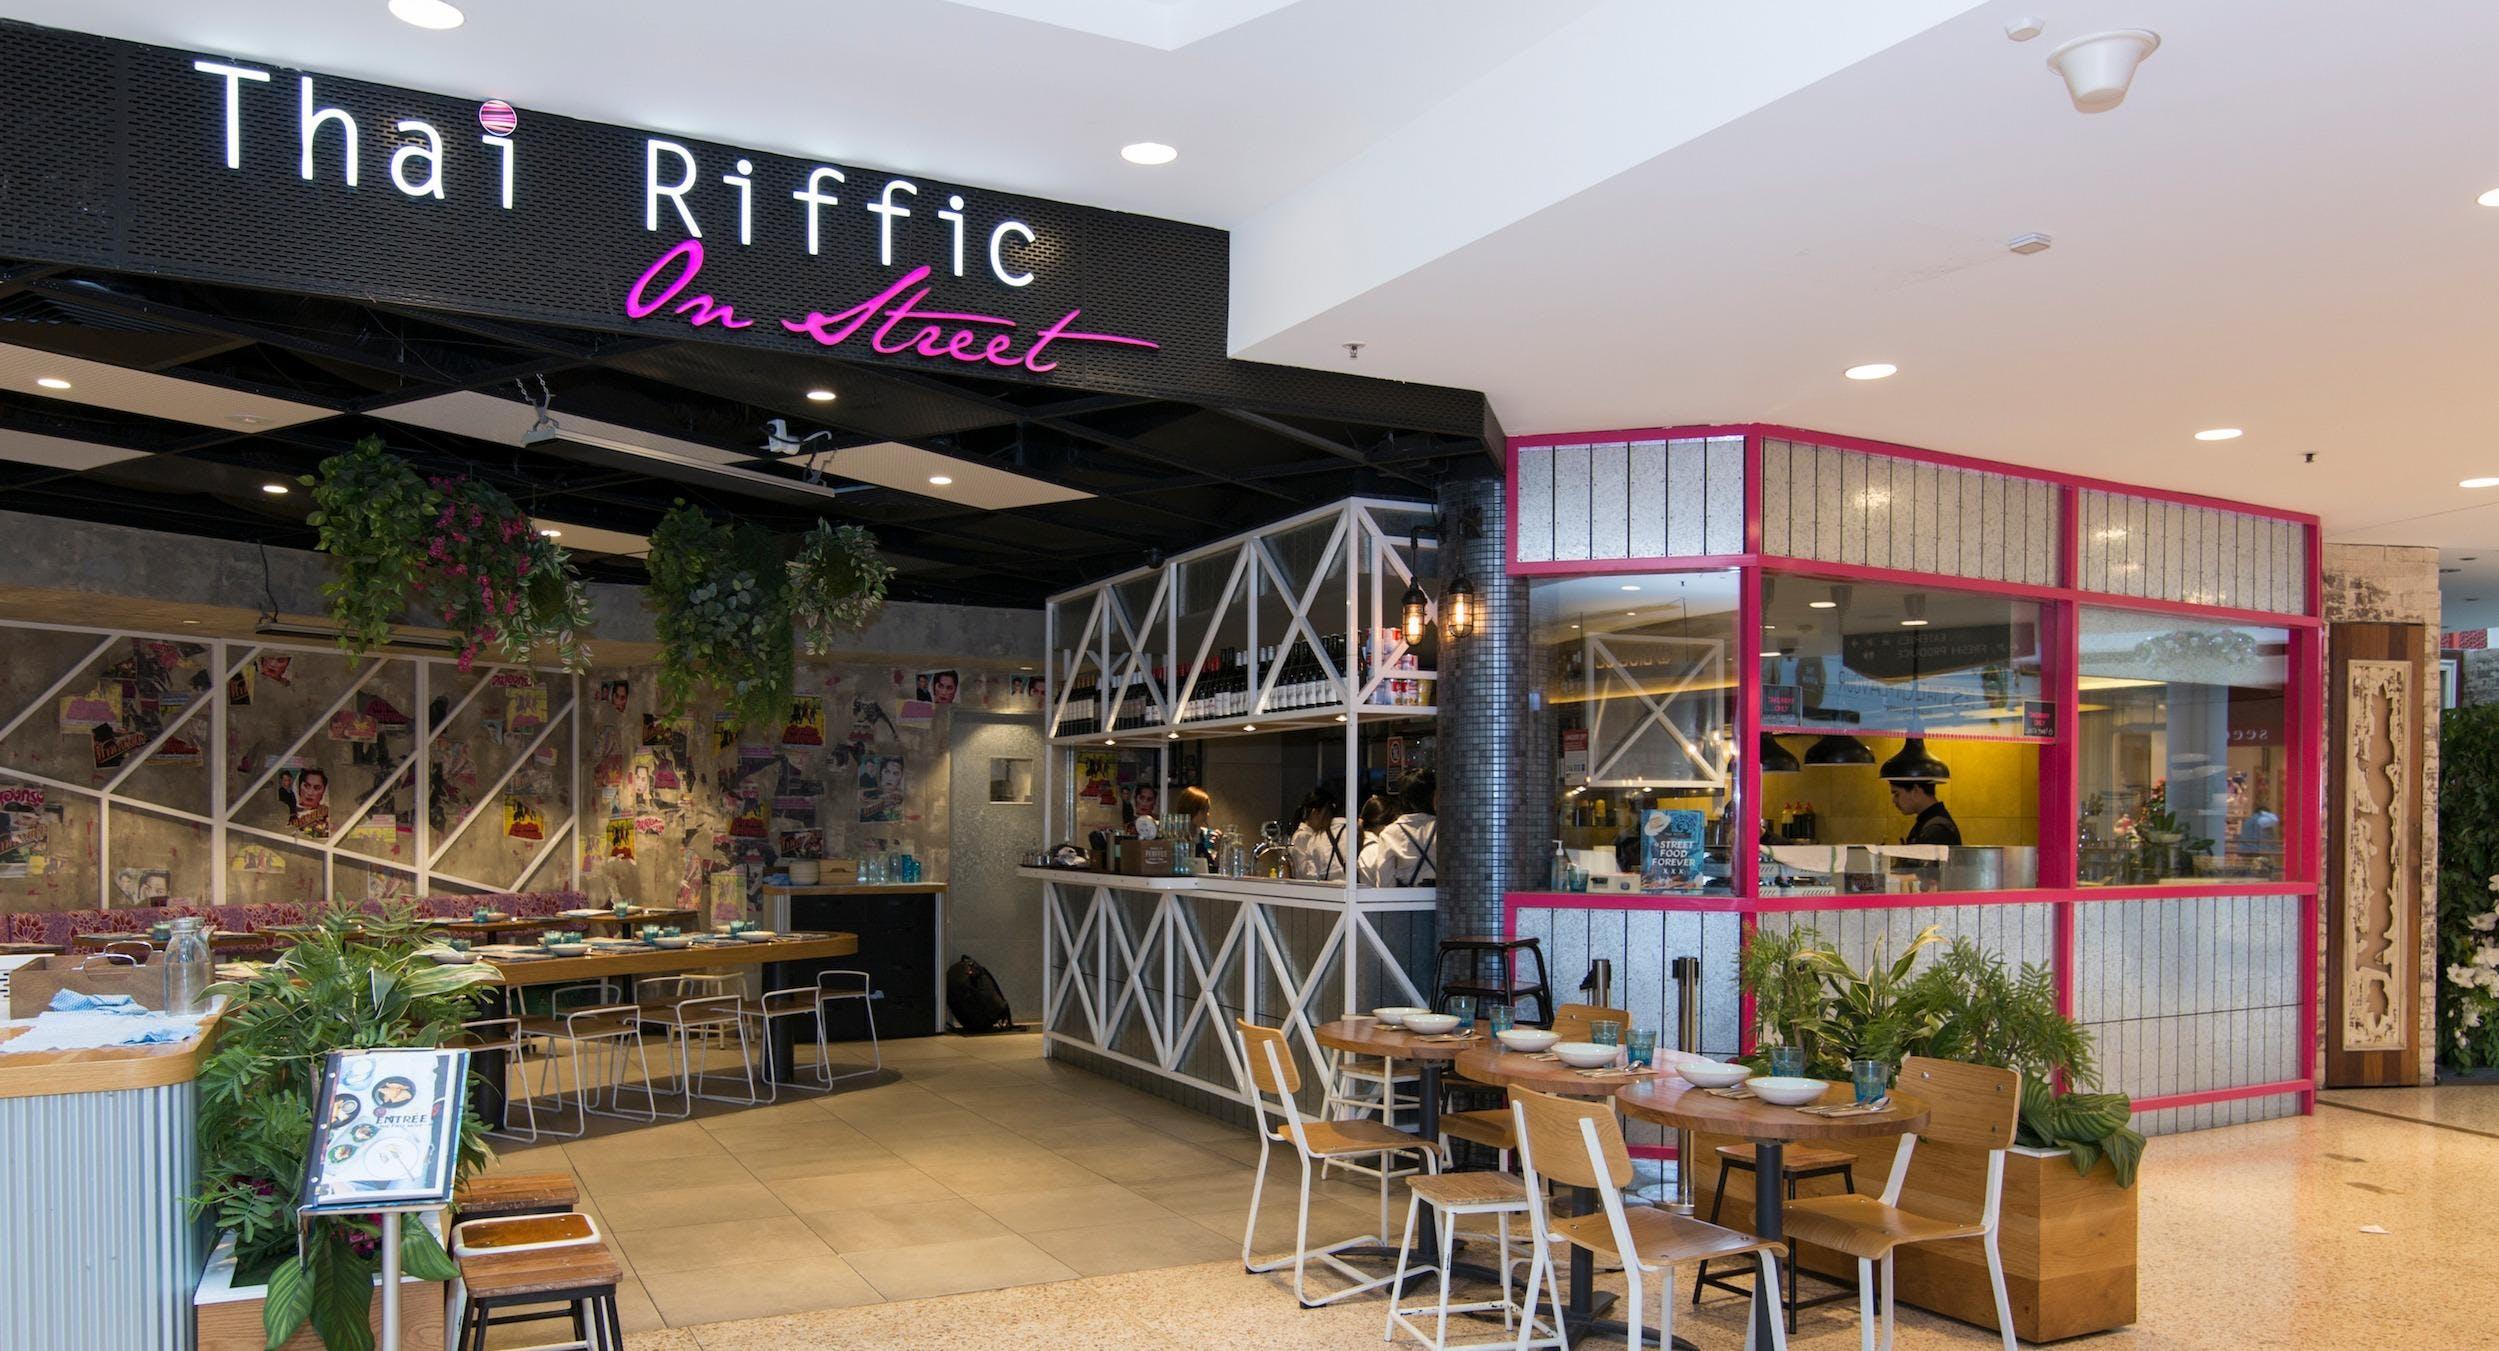 Thai Riffic On Street - Greenwood Plaza